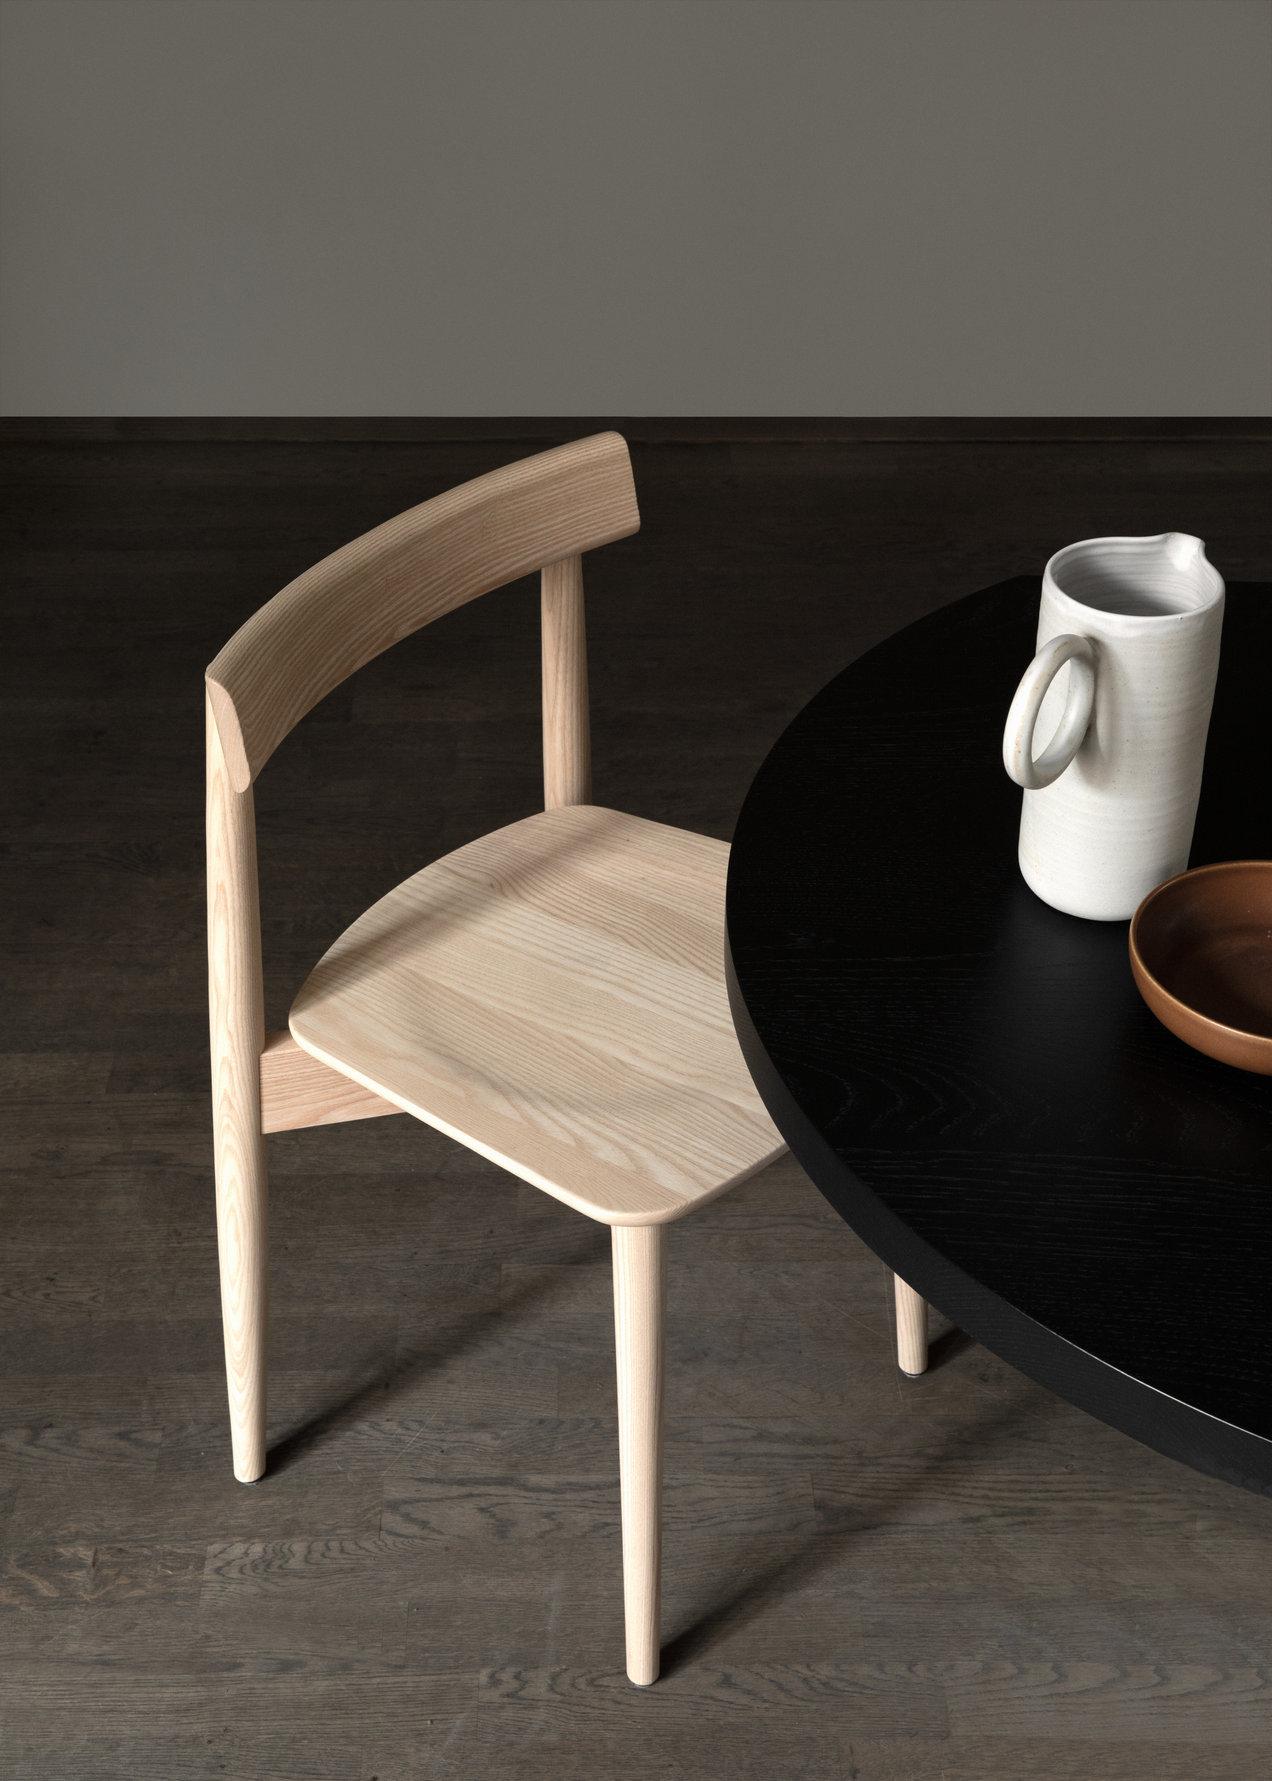 Lara--1790--lara-chair--gallerySlider-1--Ash--DM.png